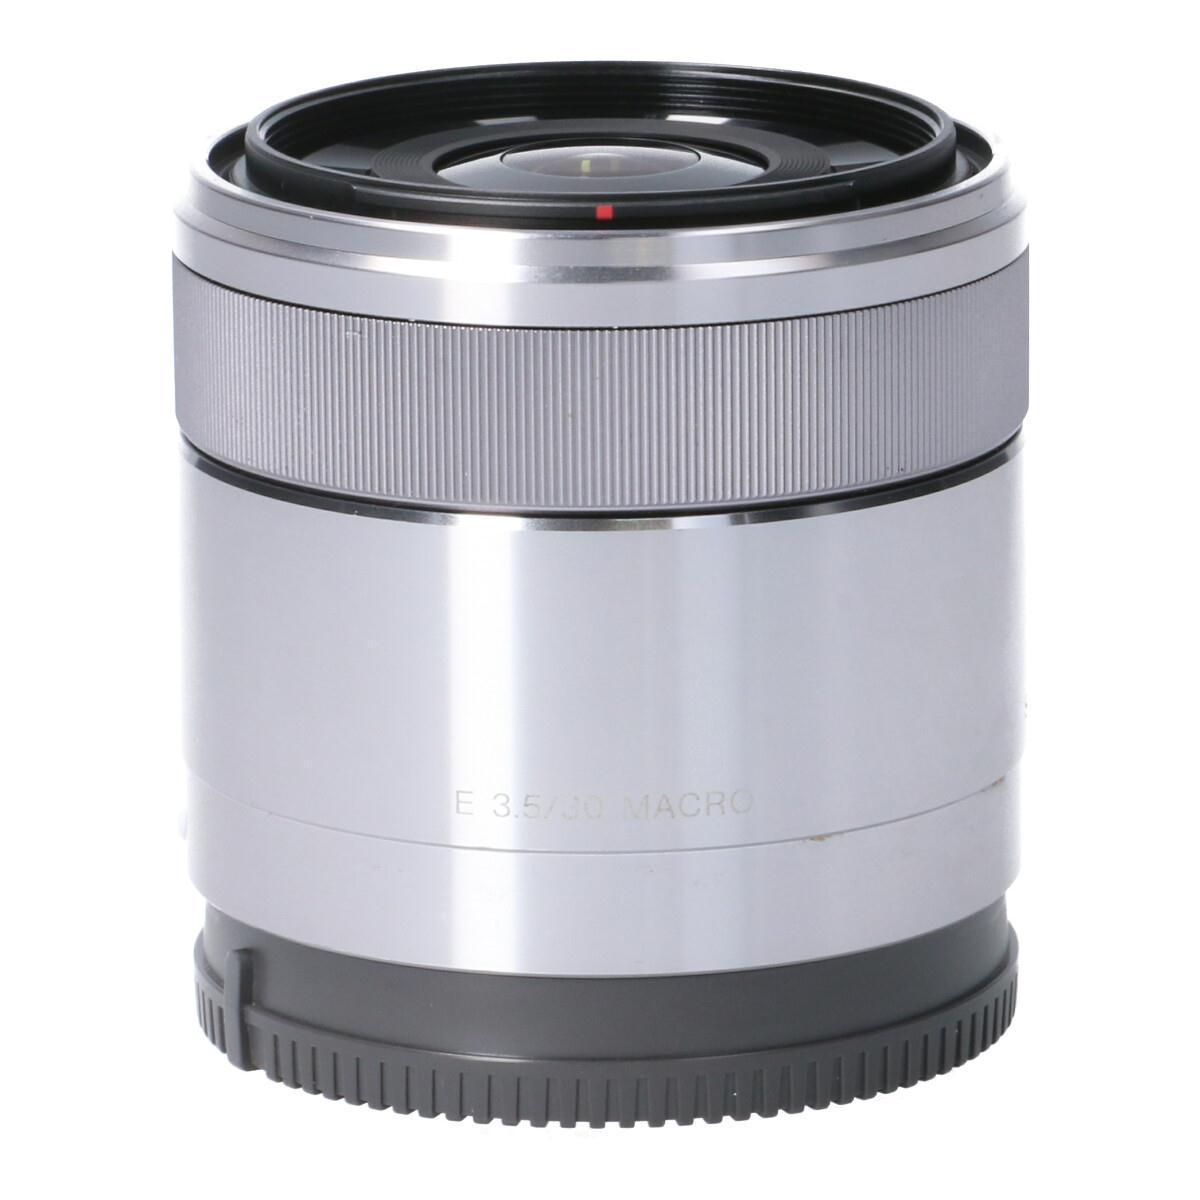 SONY E30mm F3.5MACRO(SEL30M35)【中古】